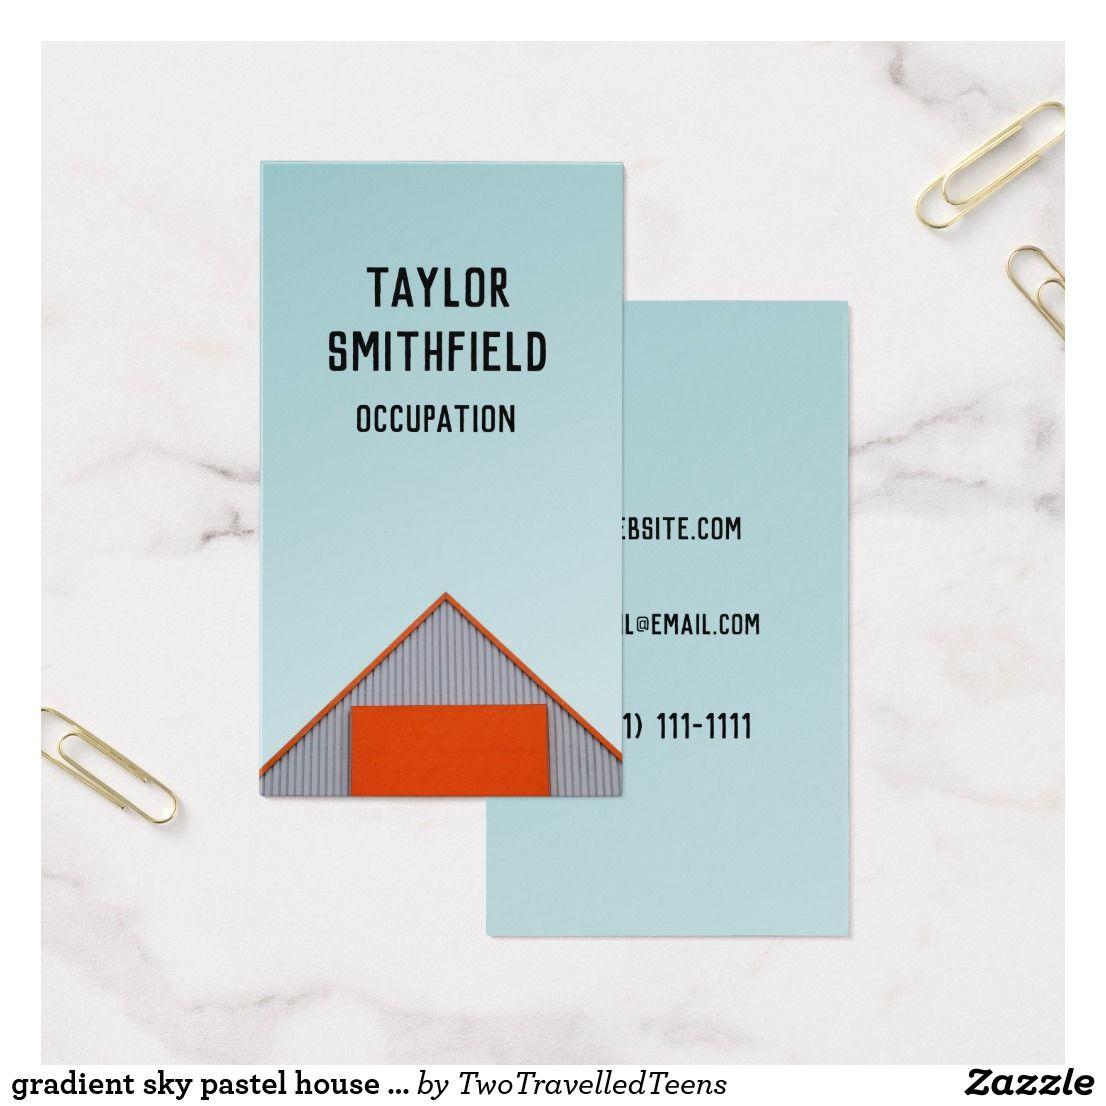 Gradient sky pastel house building business card | Pastel house ...